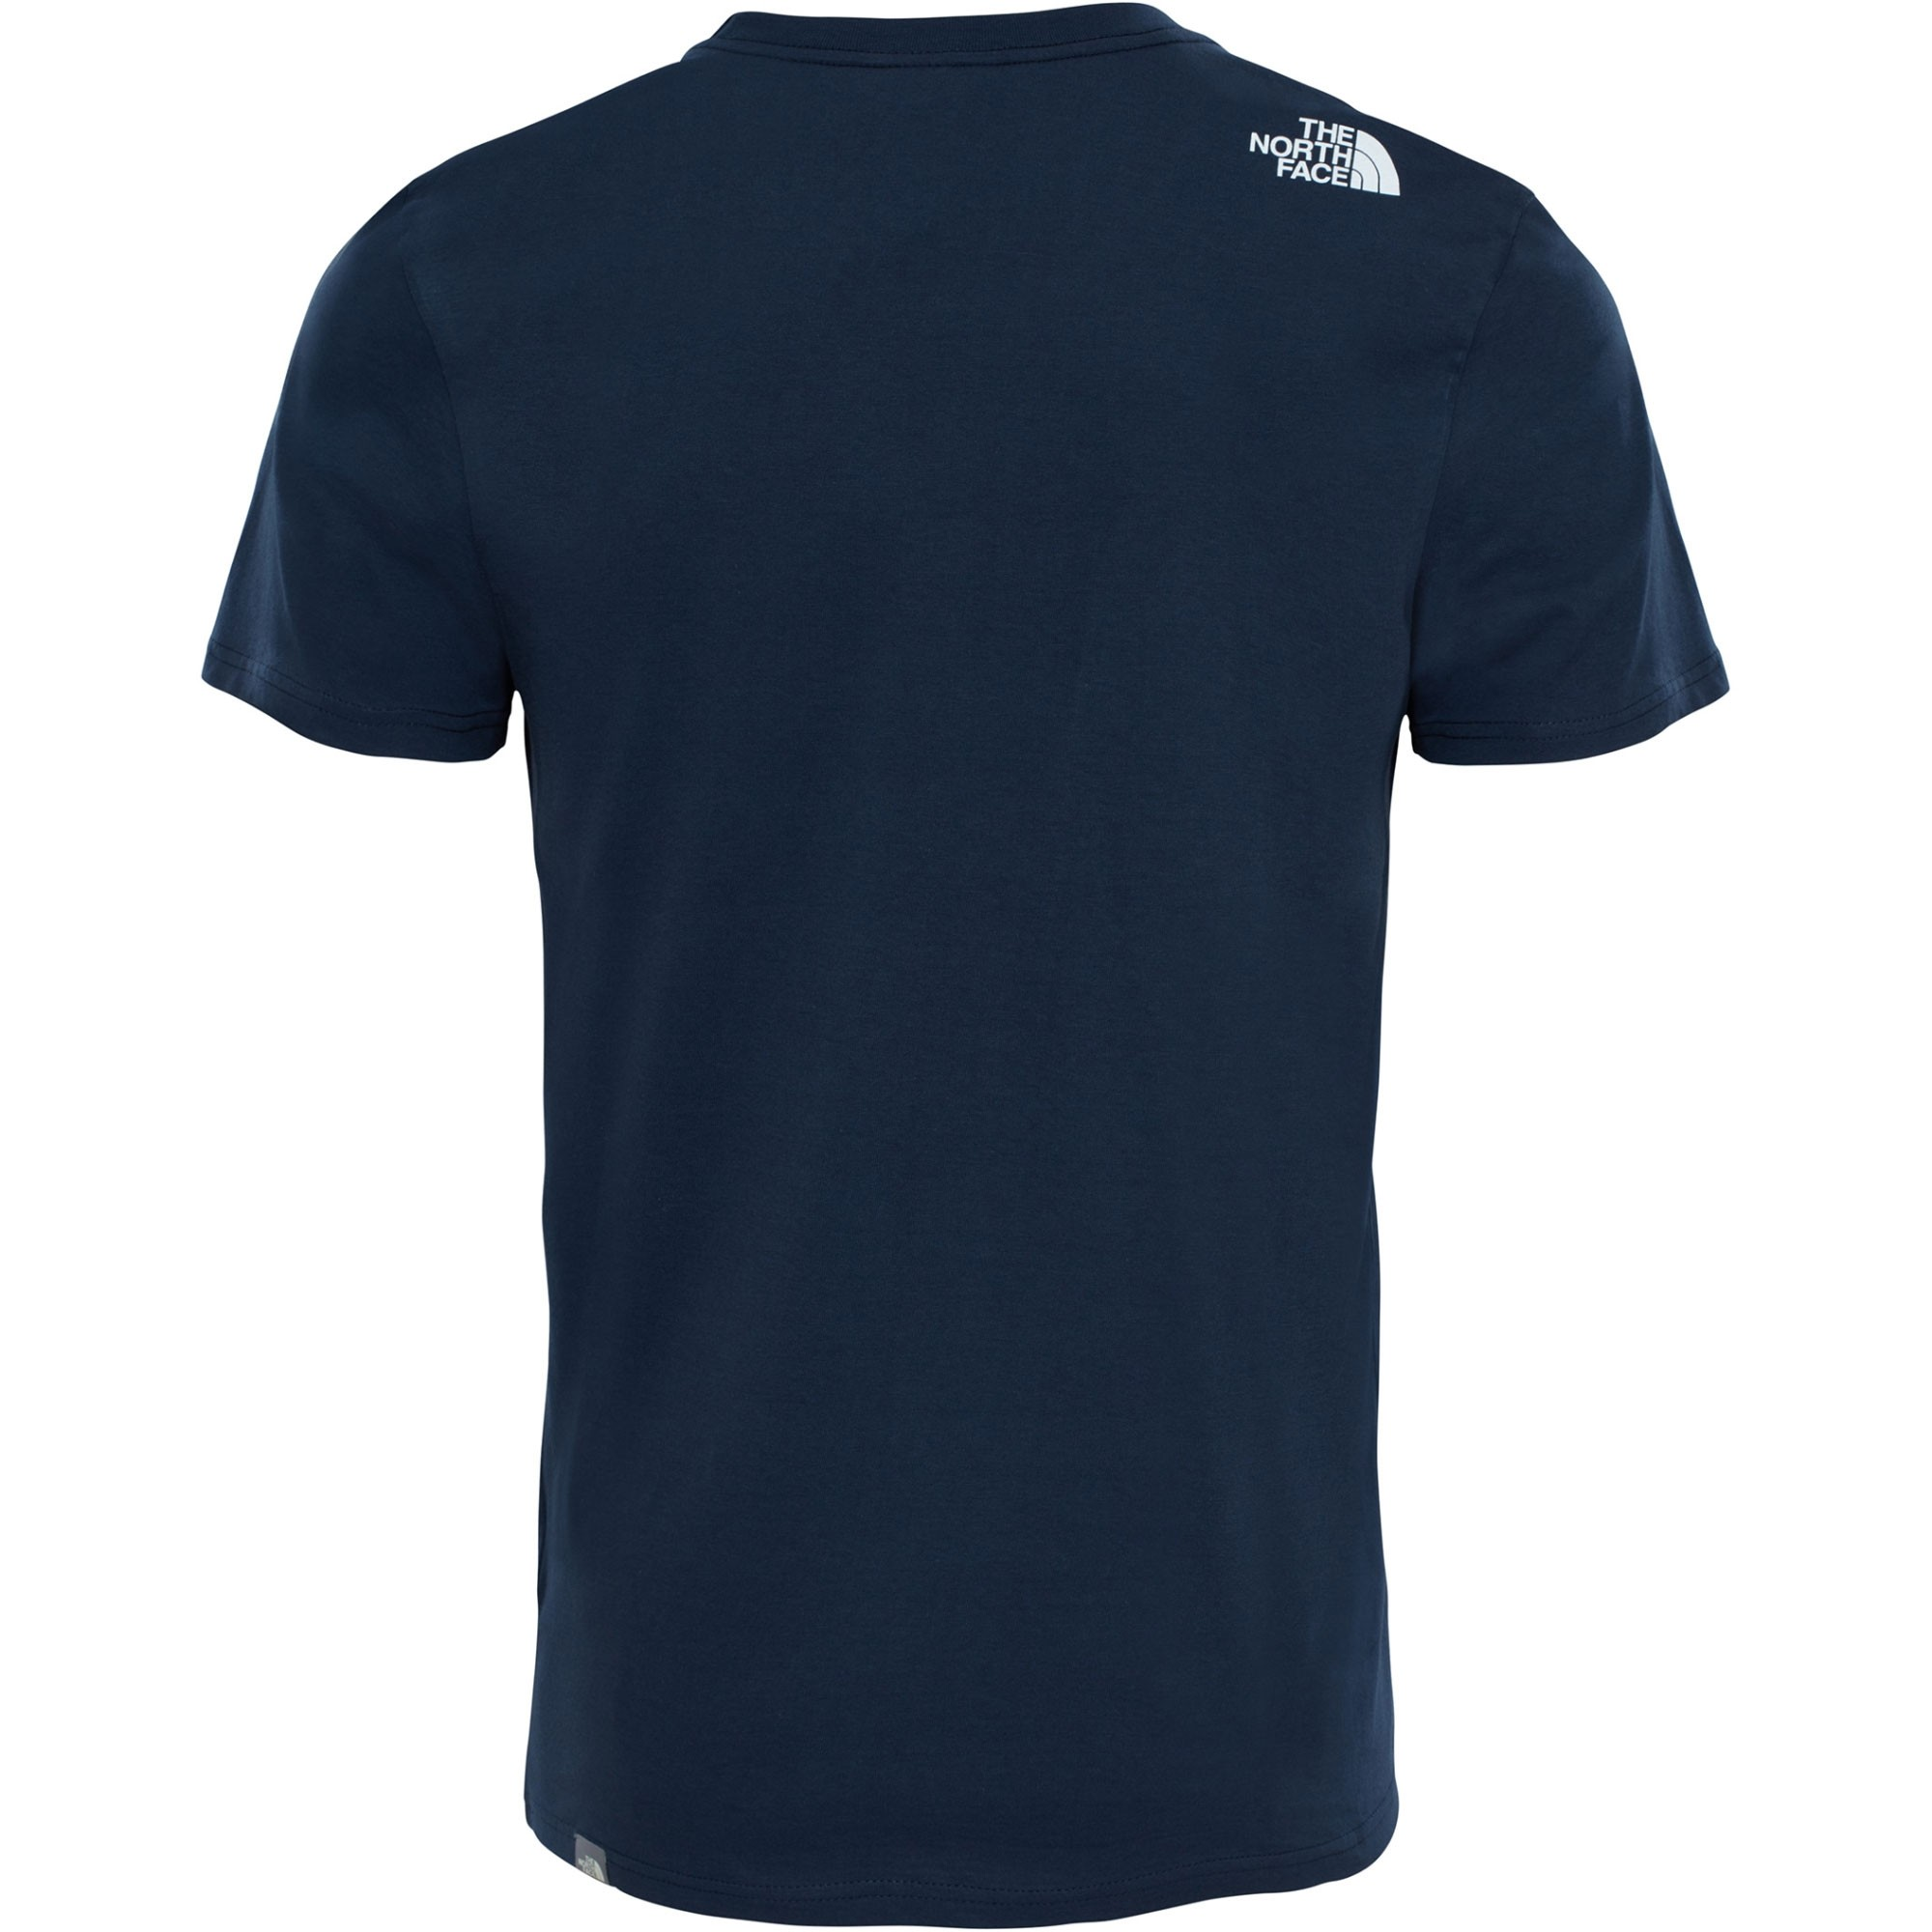 The North Face Short Sleeved Easy Tee - Urban Navy/TNF White - back